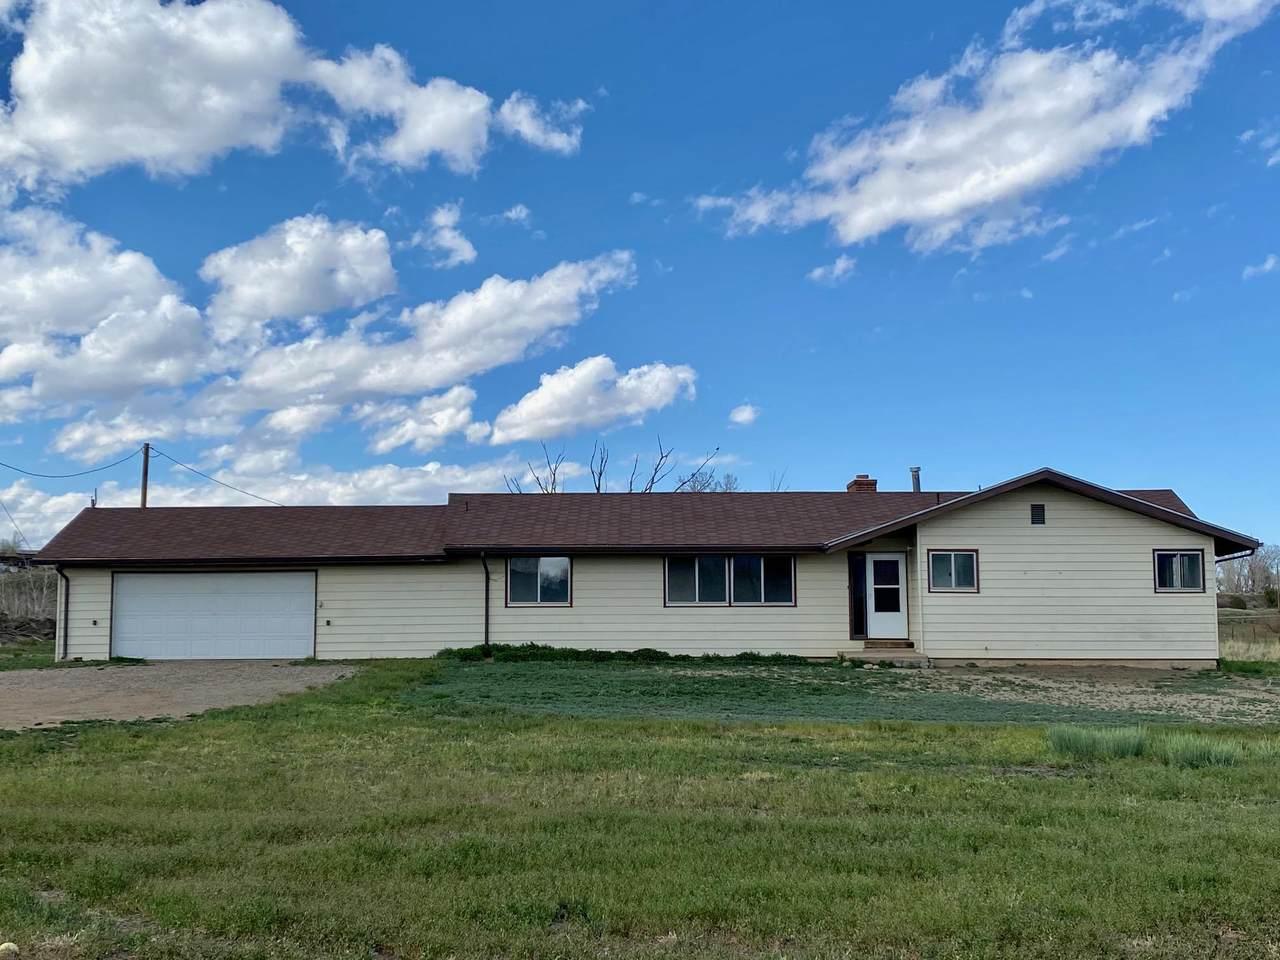 38219 County Rd 32 - Photo 1